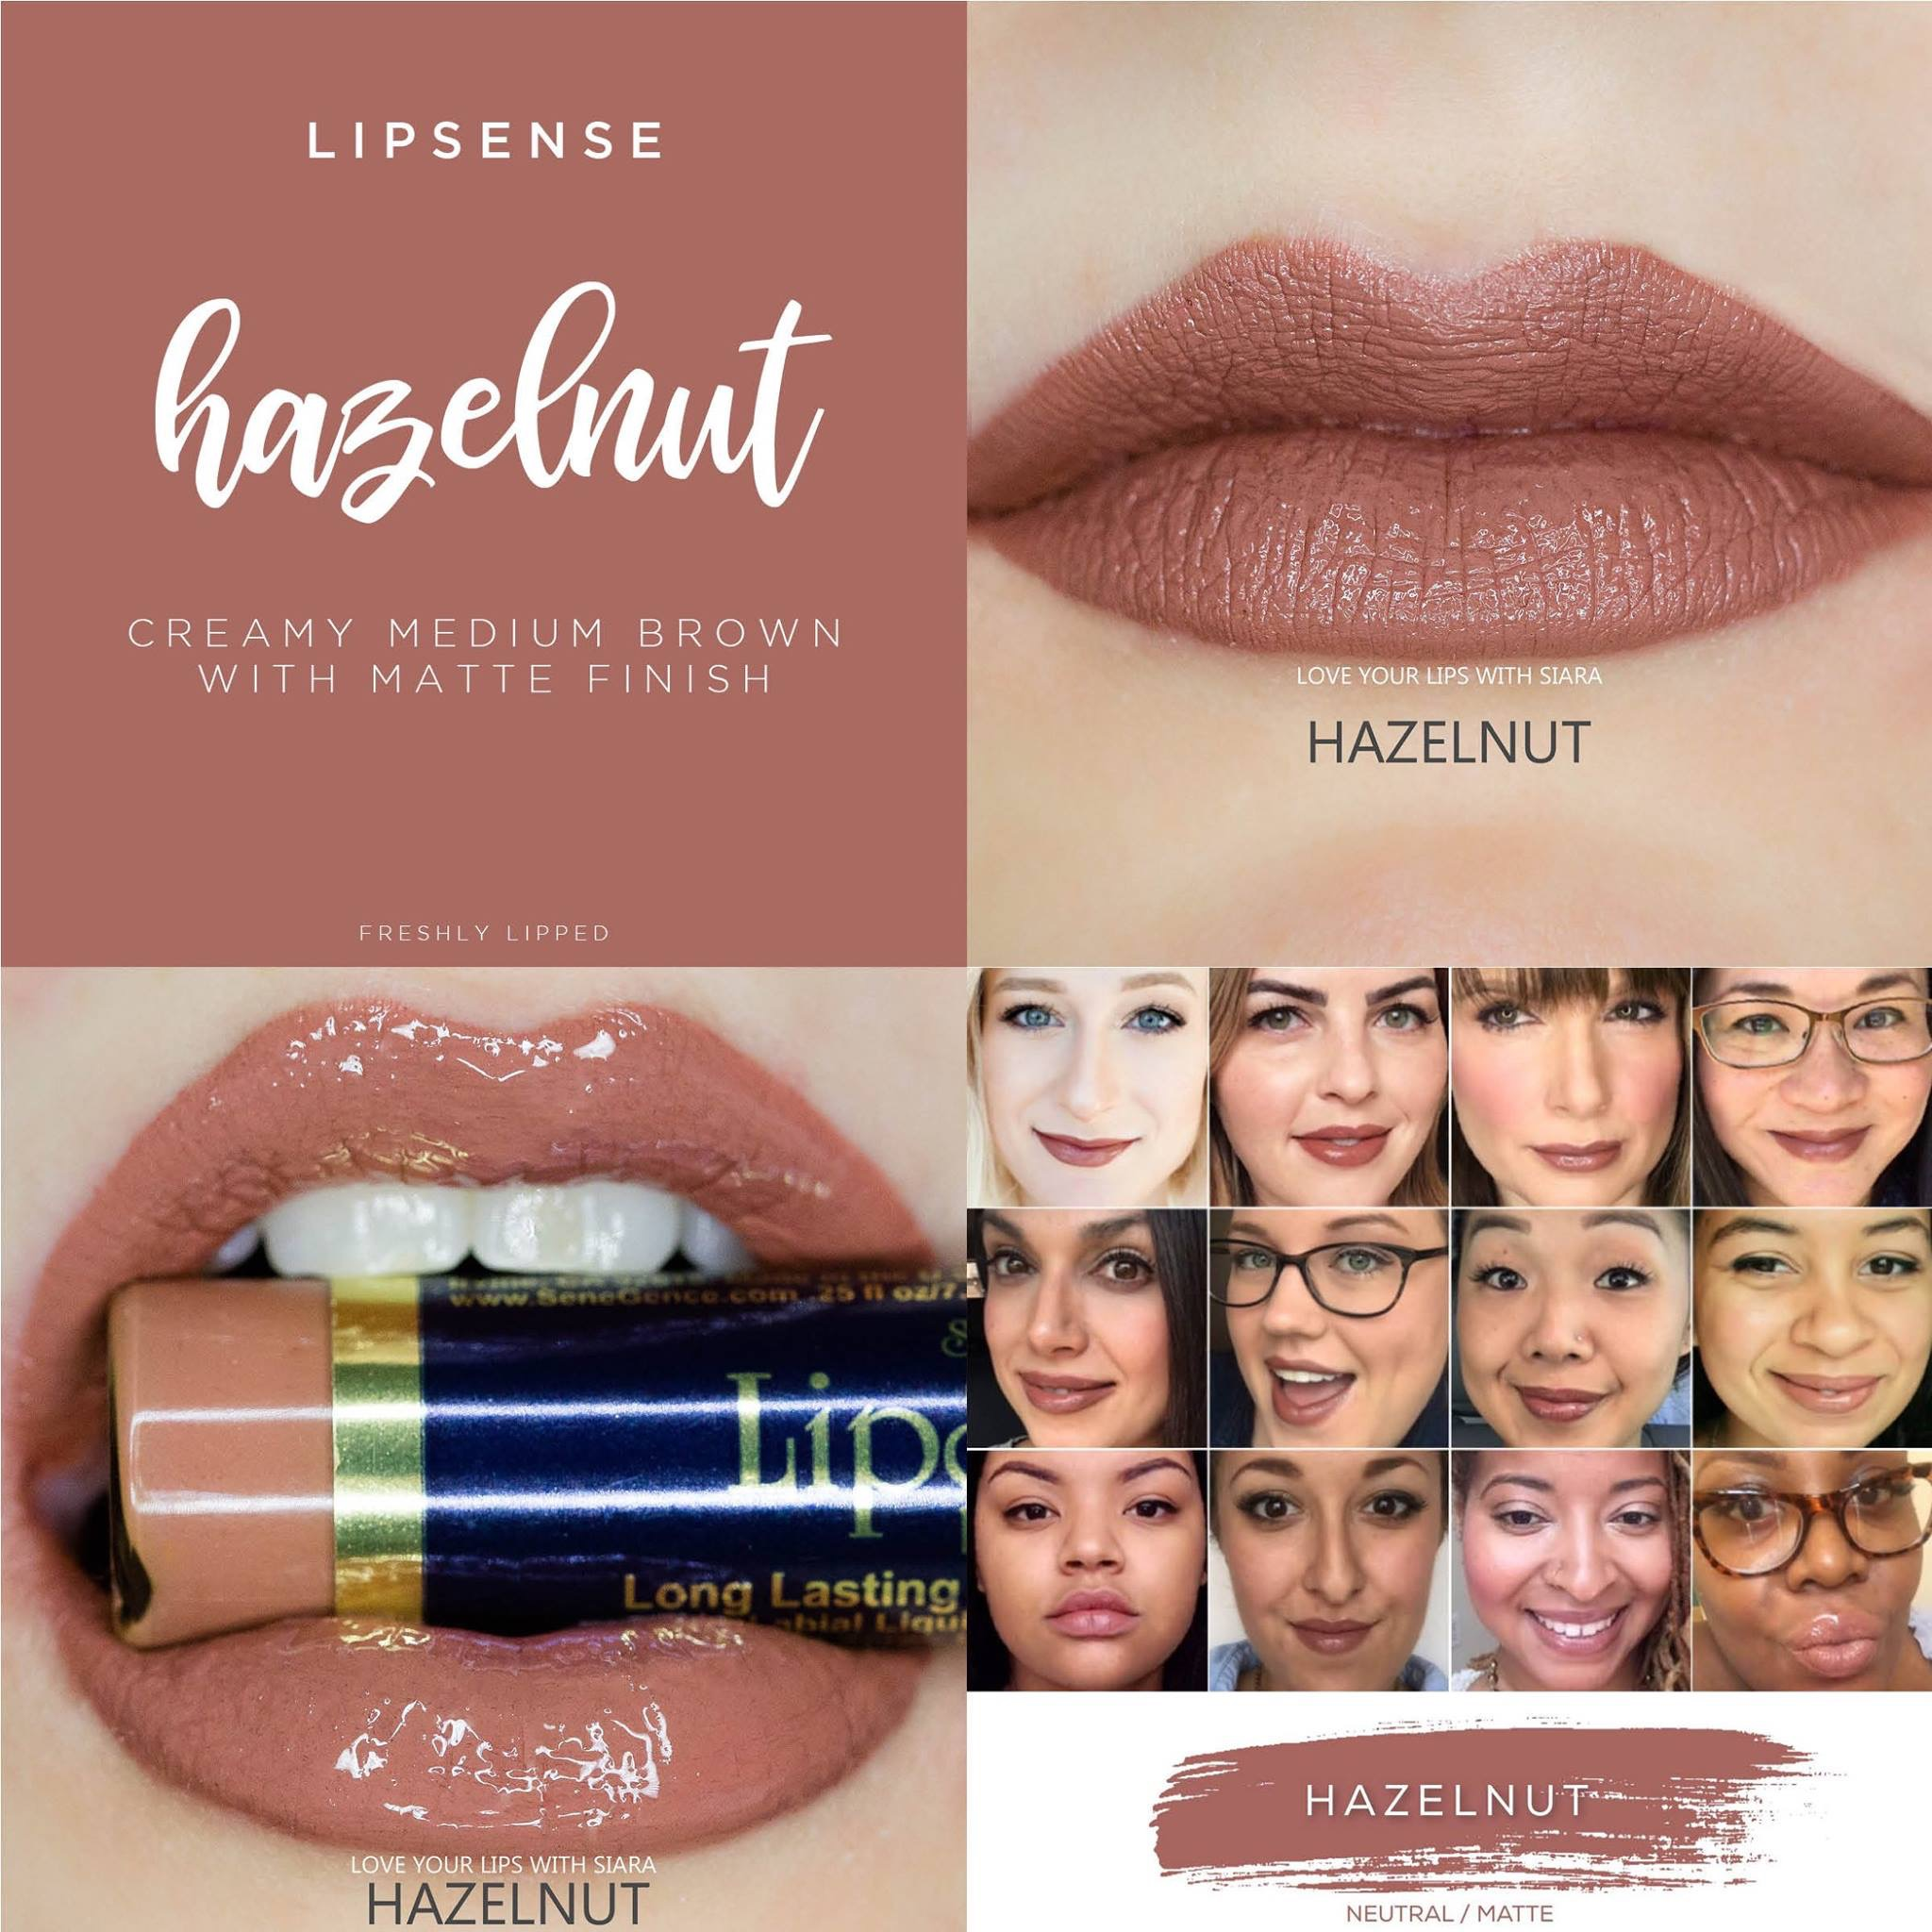 Hazelnut Lipsense Collage